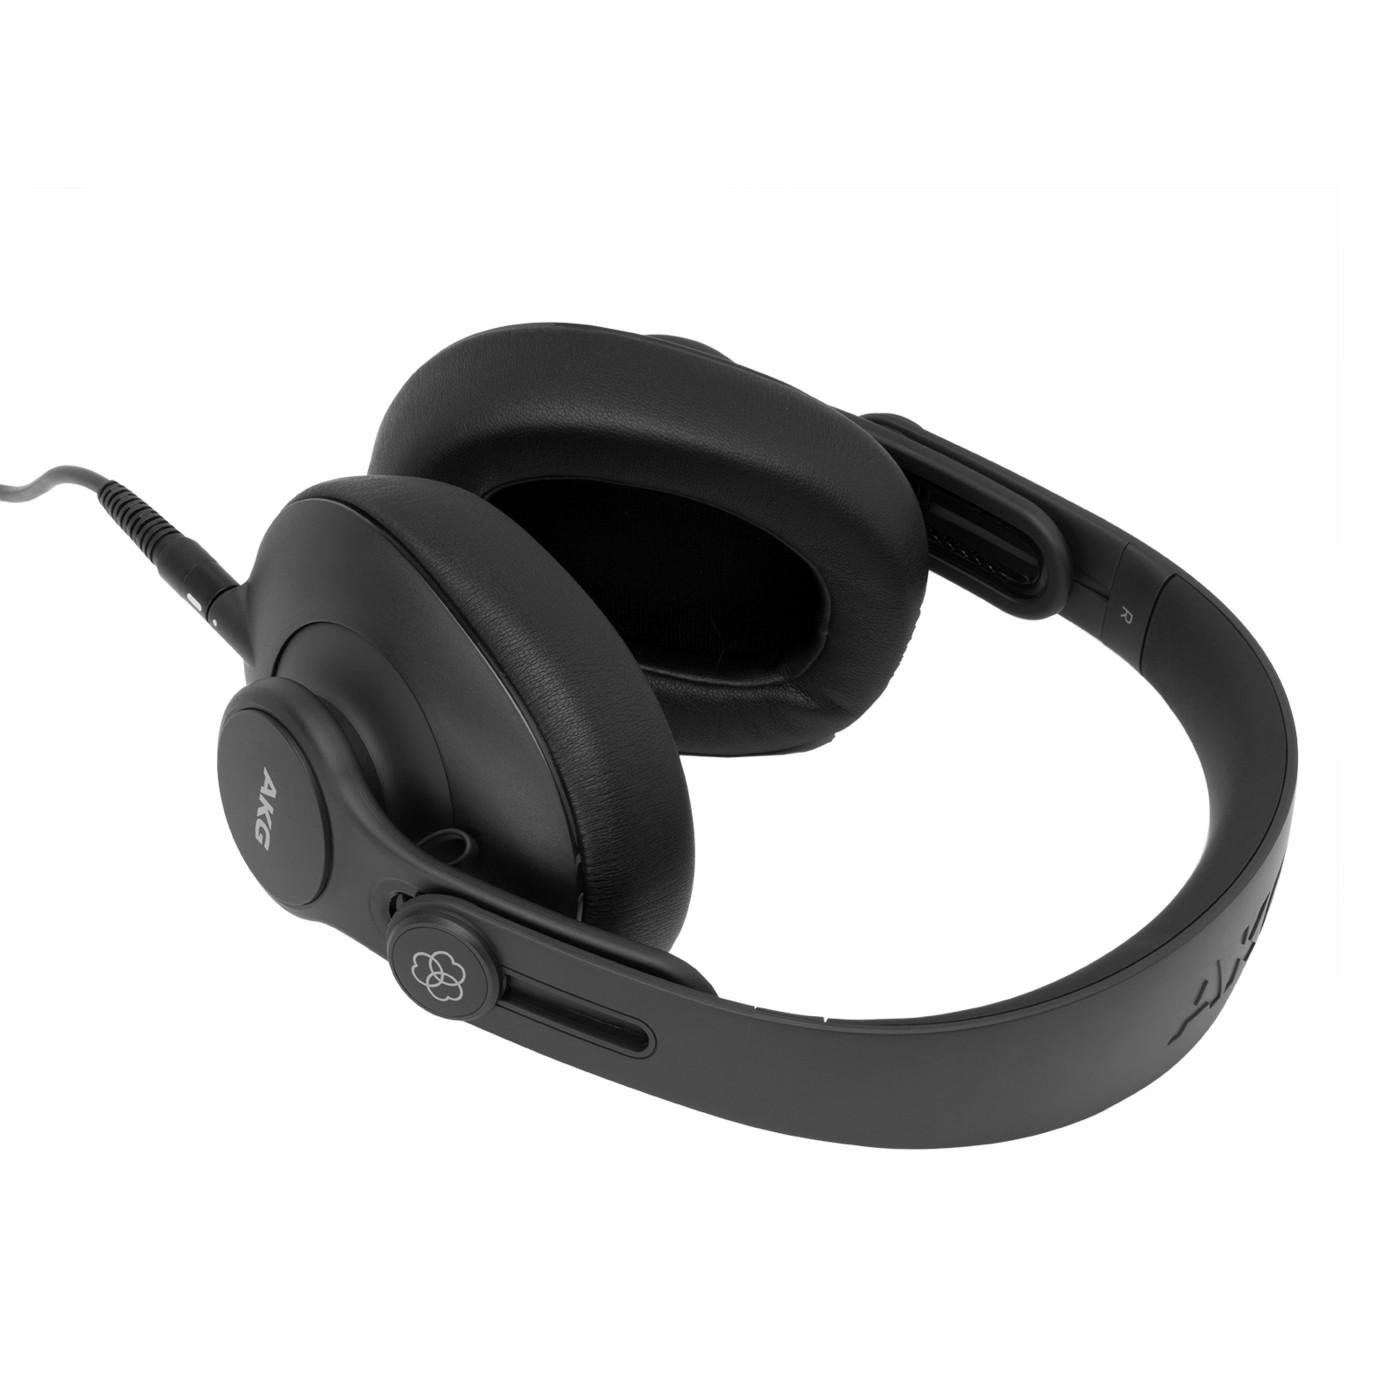 Fone De Ouvido Akg K361 Headphone Fechado Estudio K361